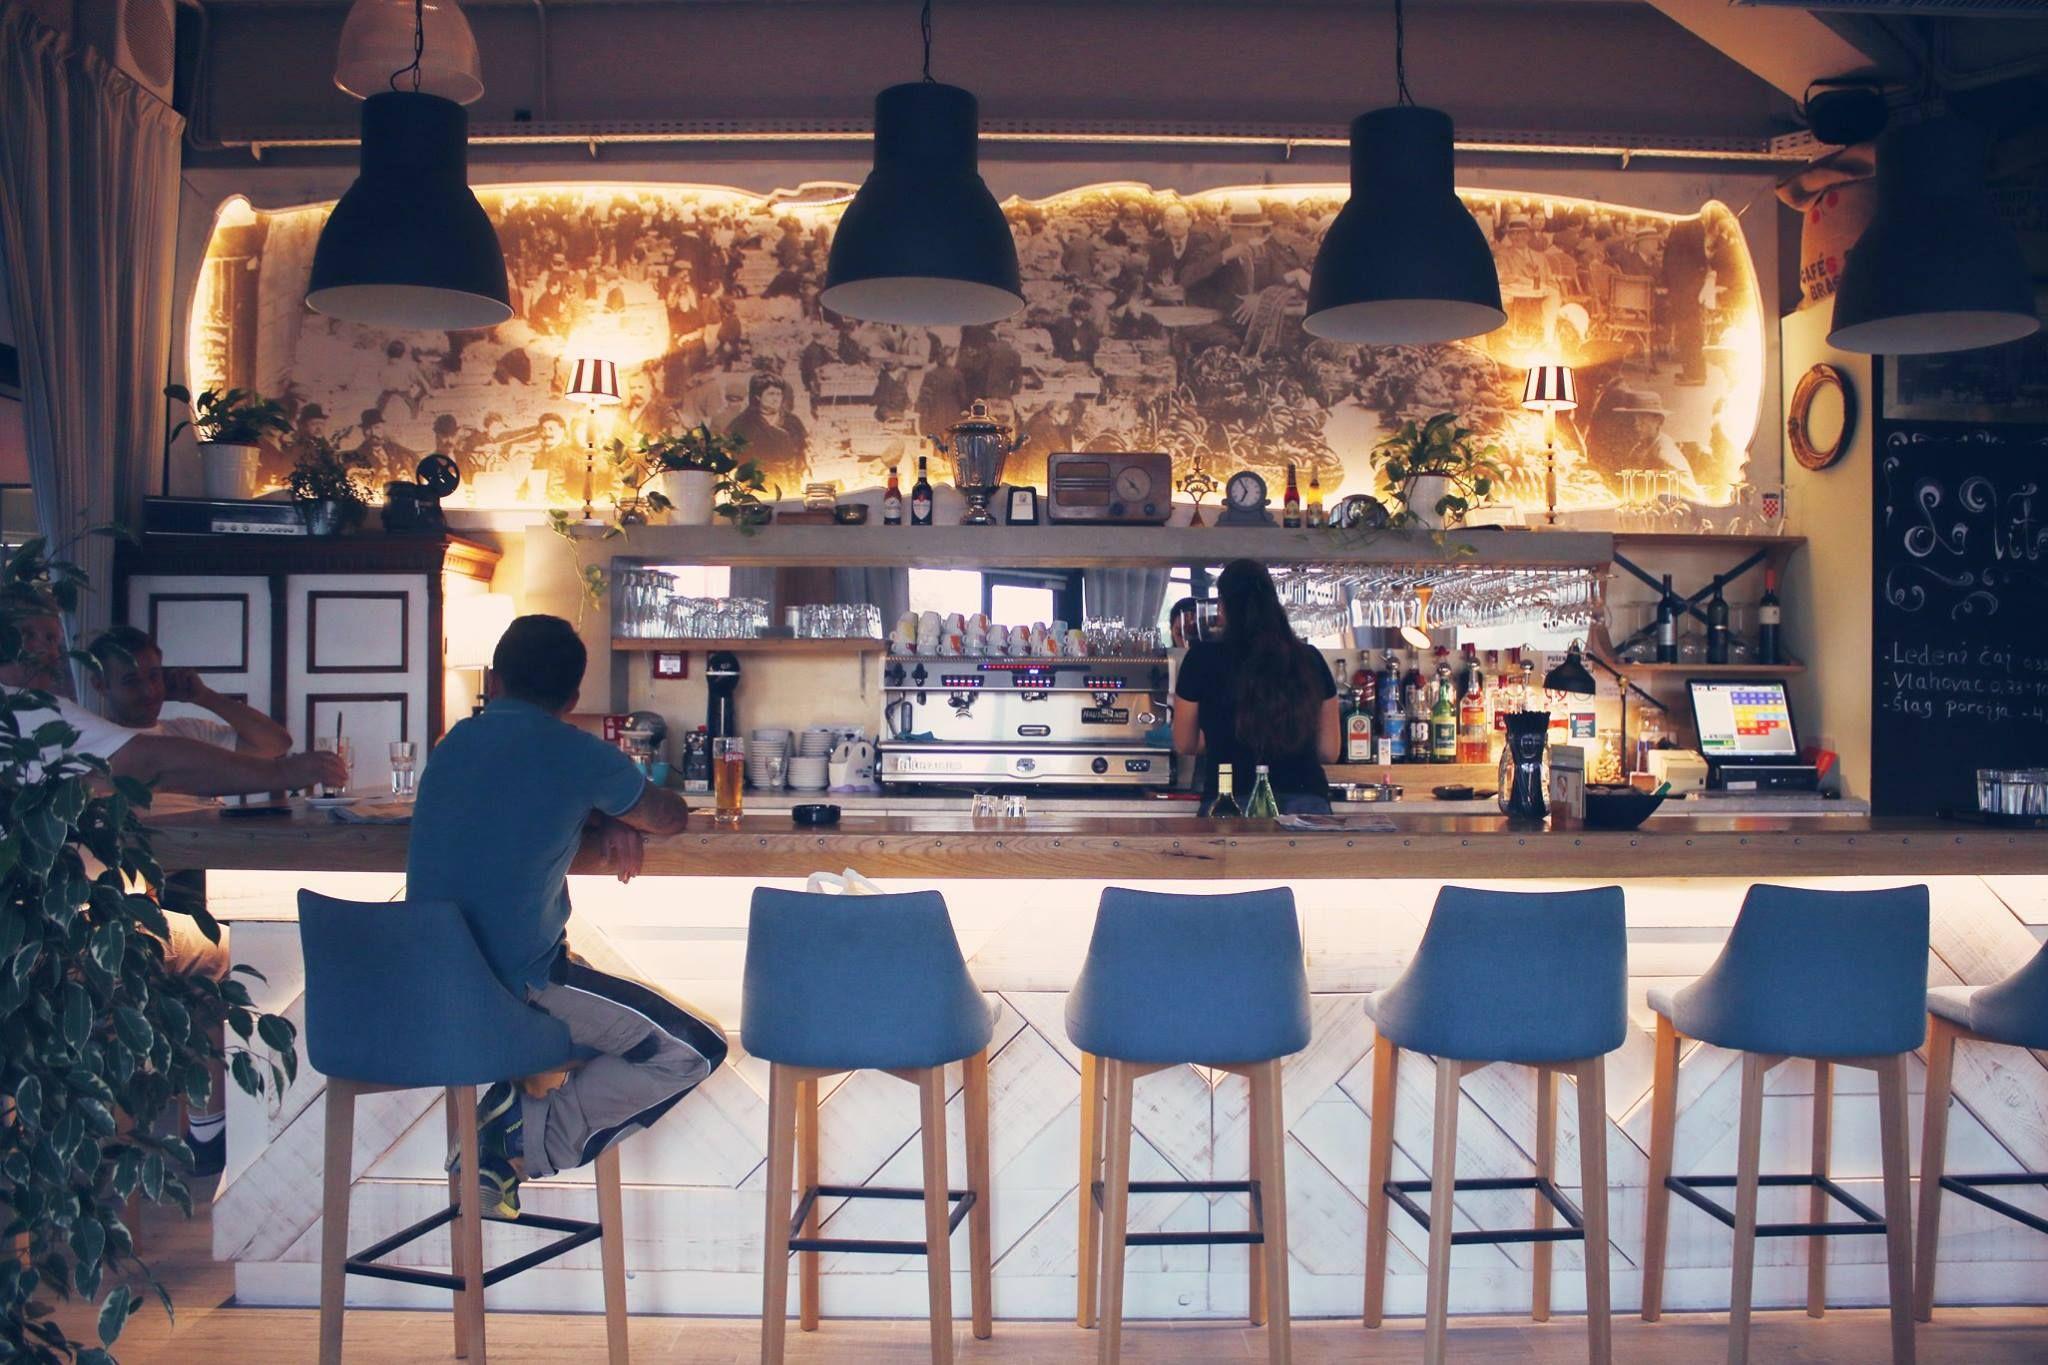 Caffe Bar La Vita In Rijeka Croatia With Images Bar